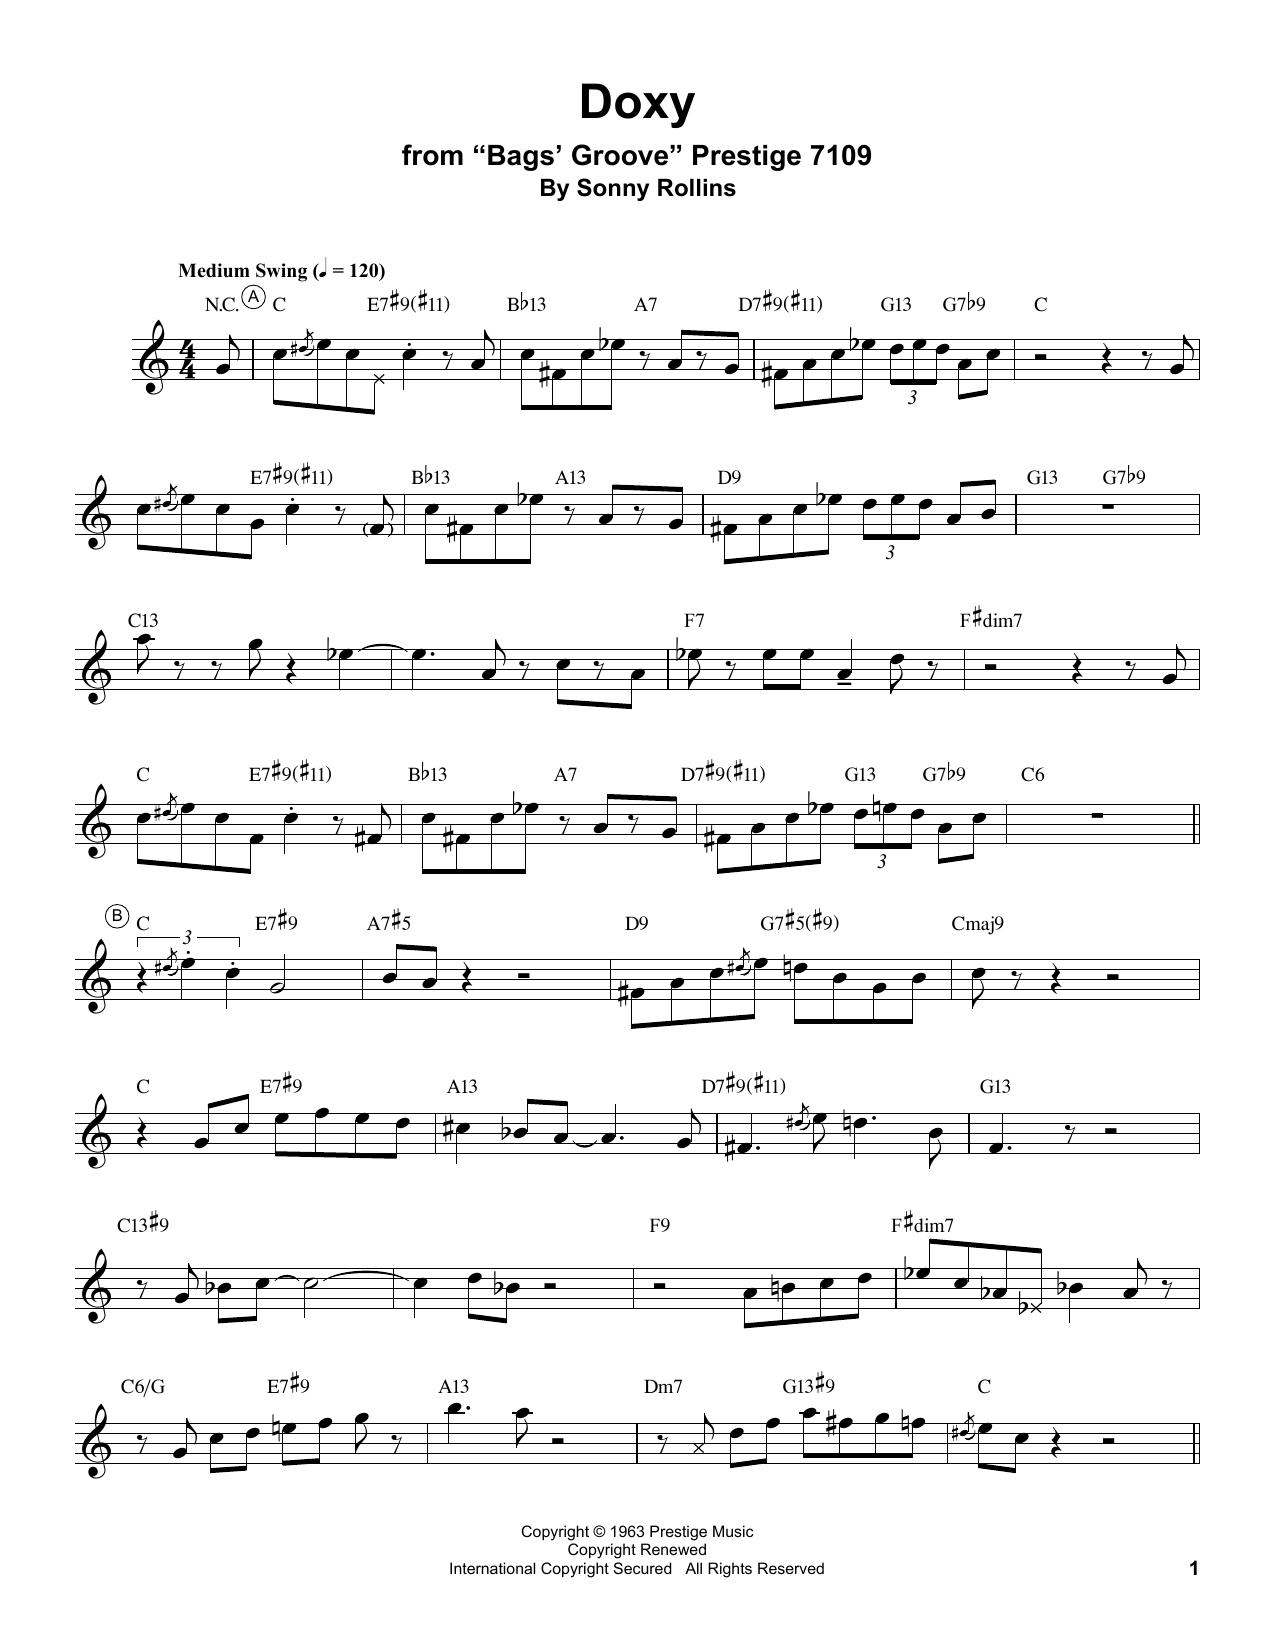 Miles Davis 'Doxy' Sheet Music Notes, Chords   Download Printable Trumpet  Transcription - SKU: 199055